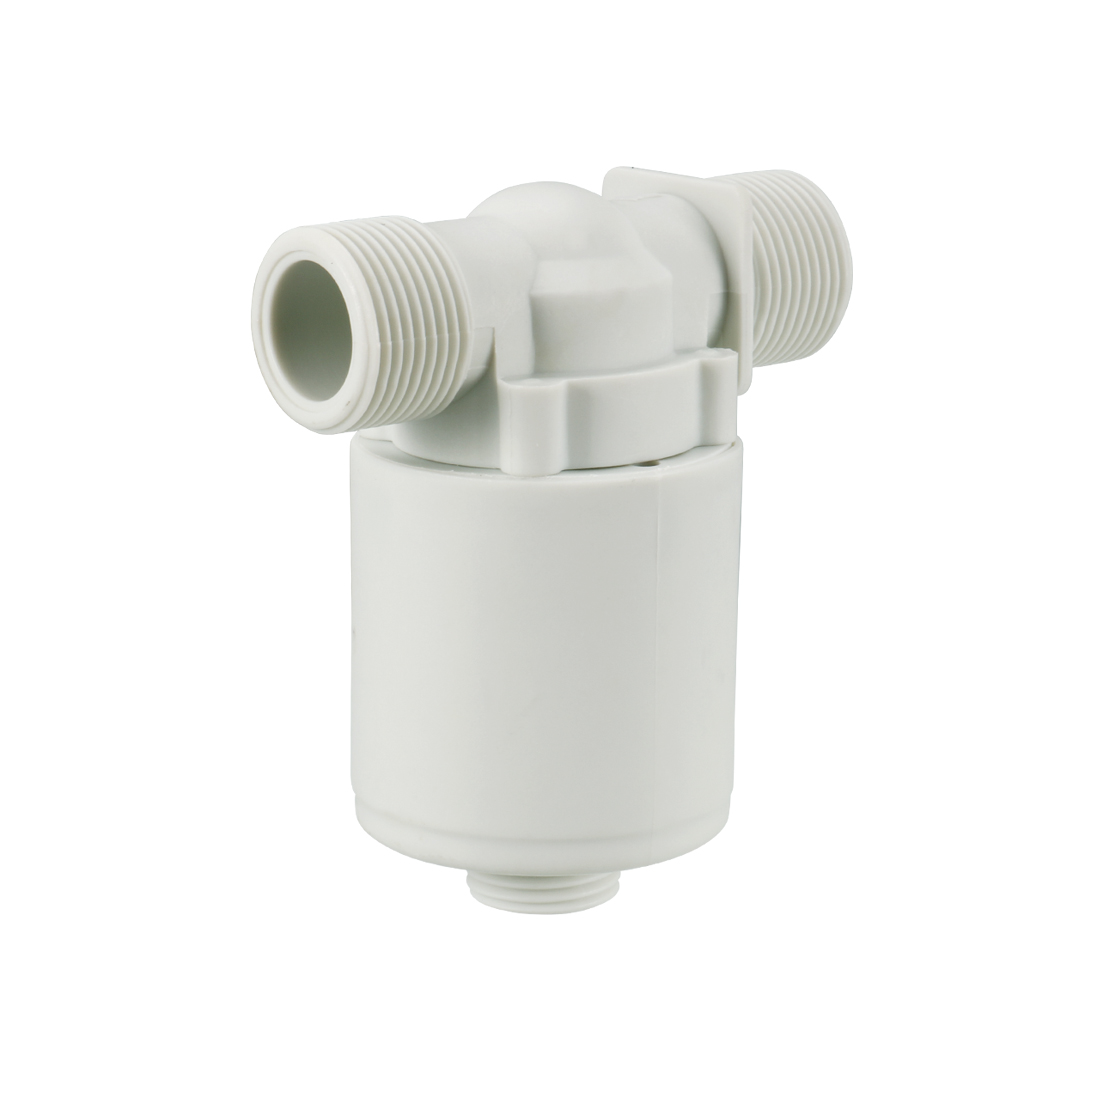 Float Ball Valve G3/4 Thread Plastic Horizontal Exterior Water Level Sensor